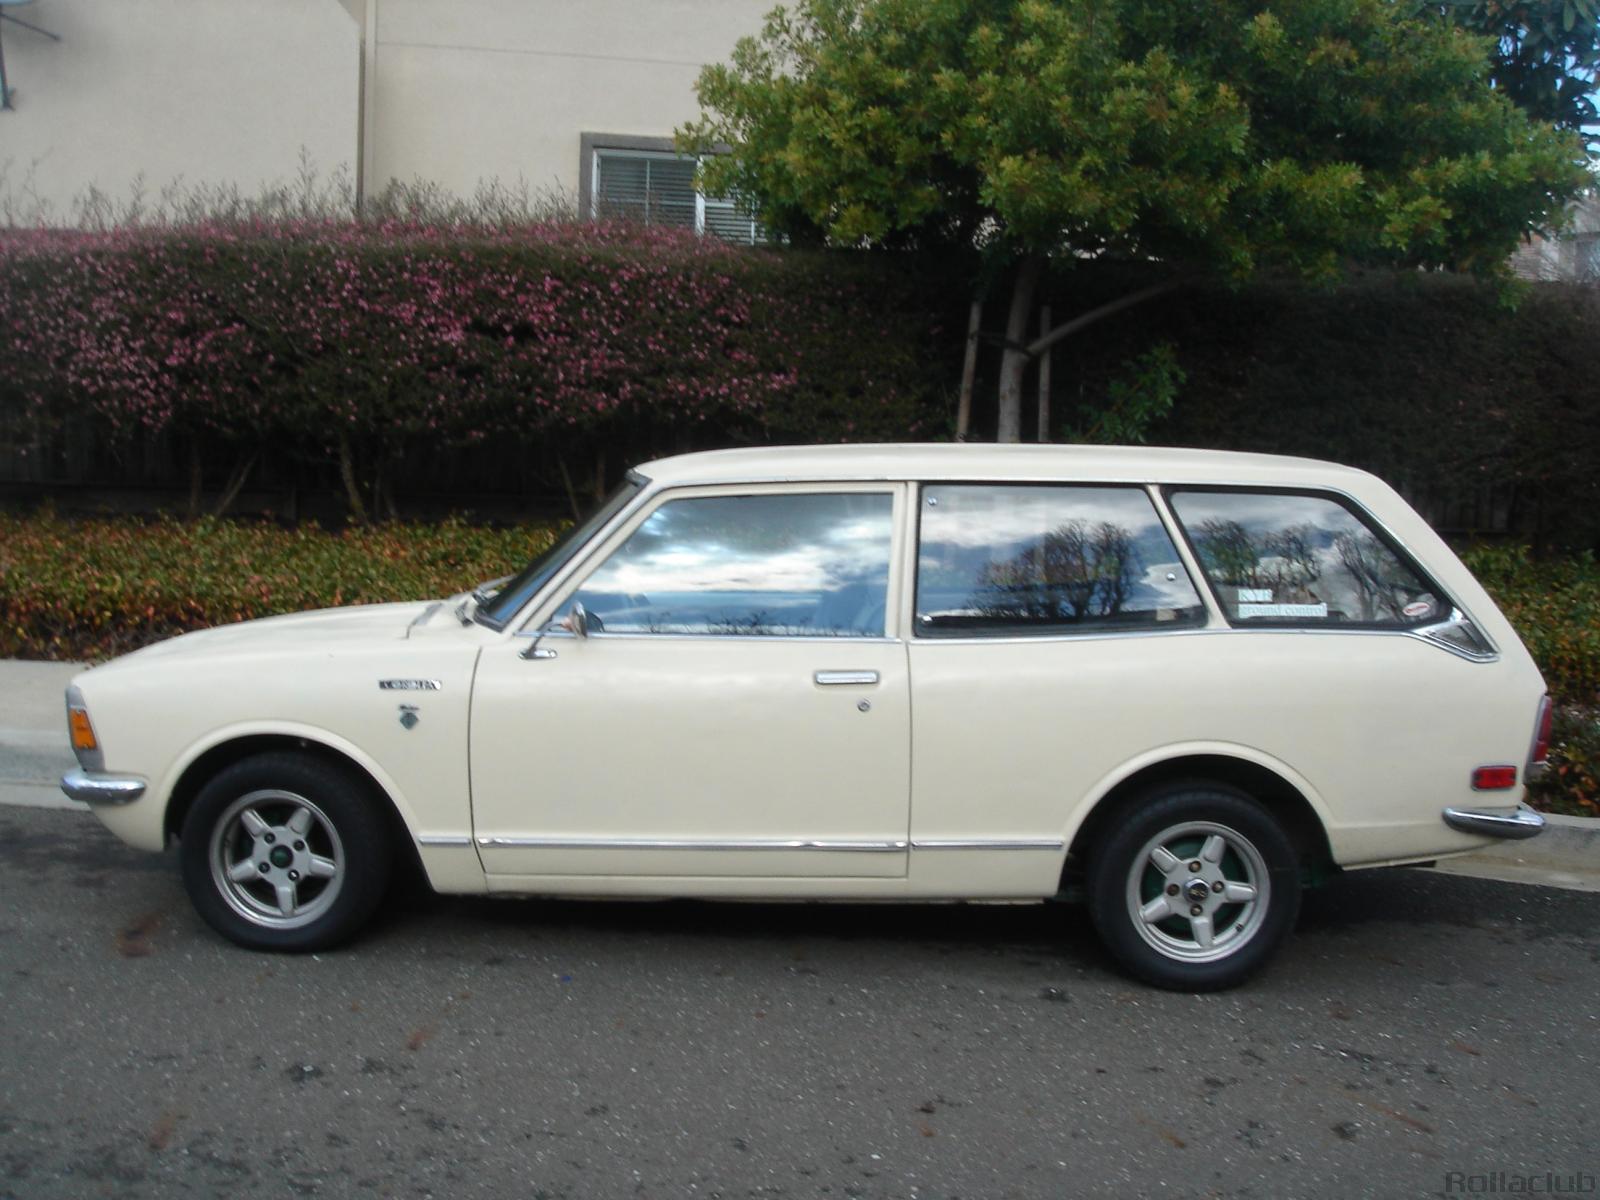 1971 Toyota Corolla Wagon Jpg Members Gallery Rollaclub Com